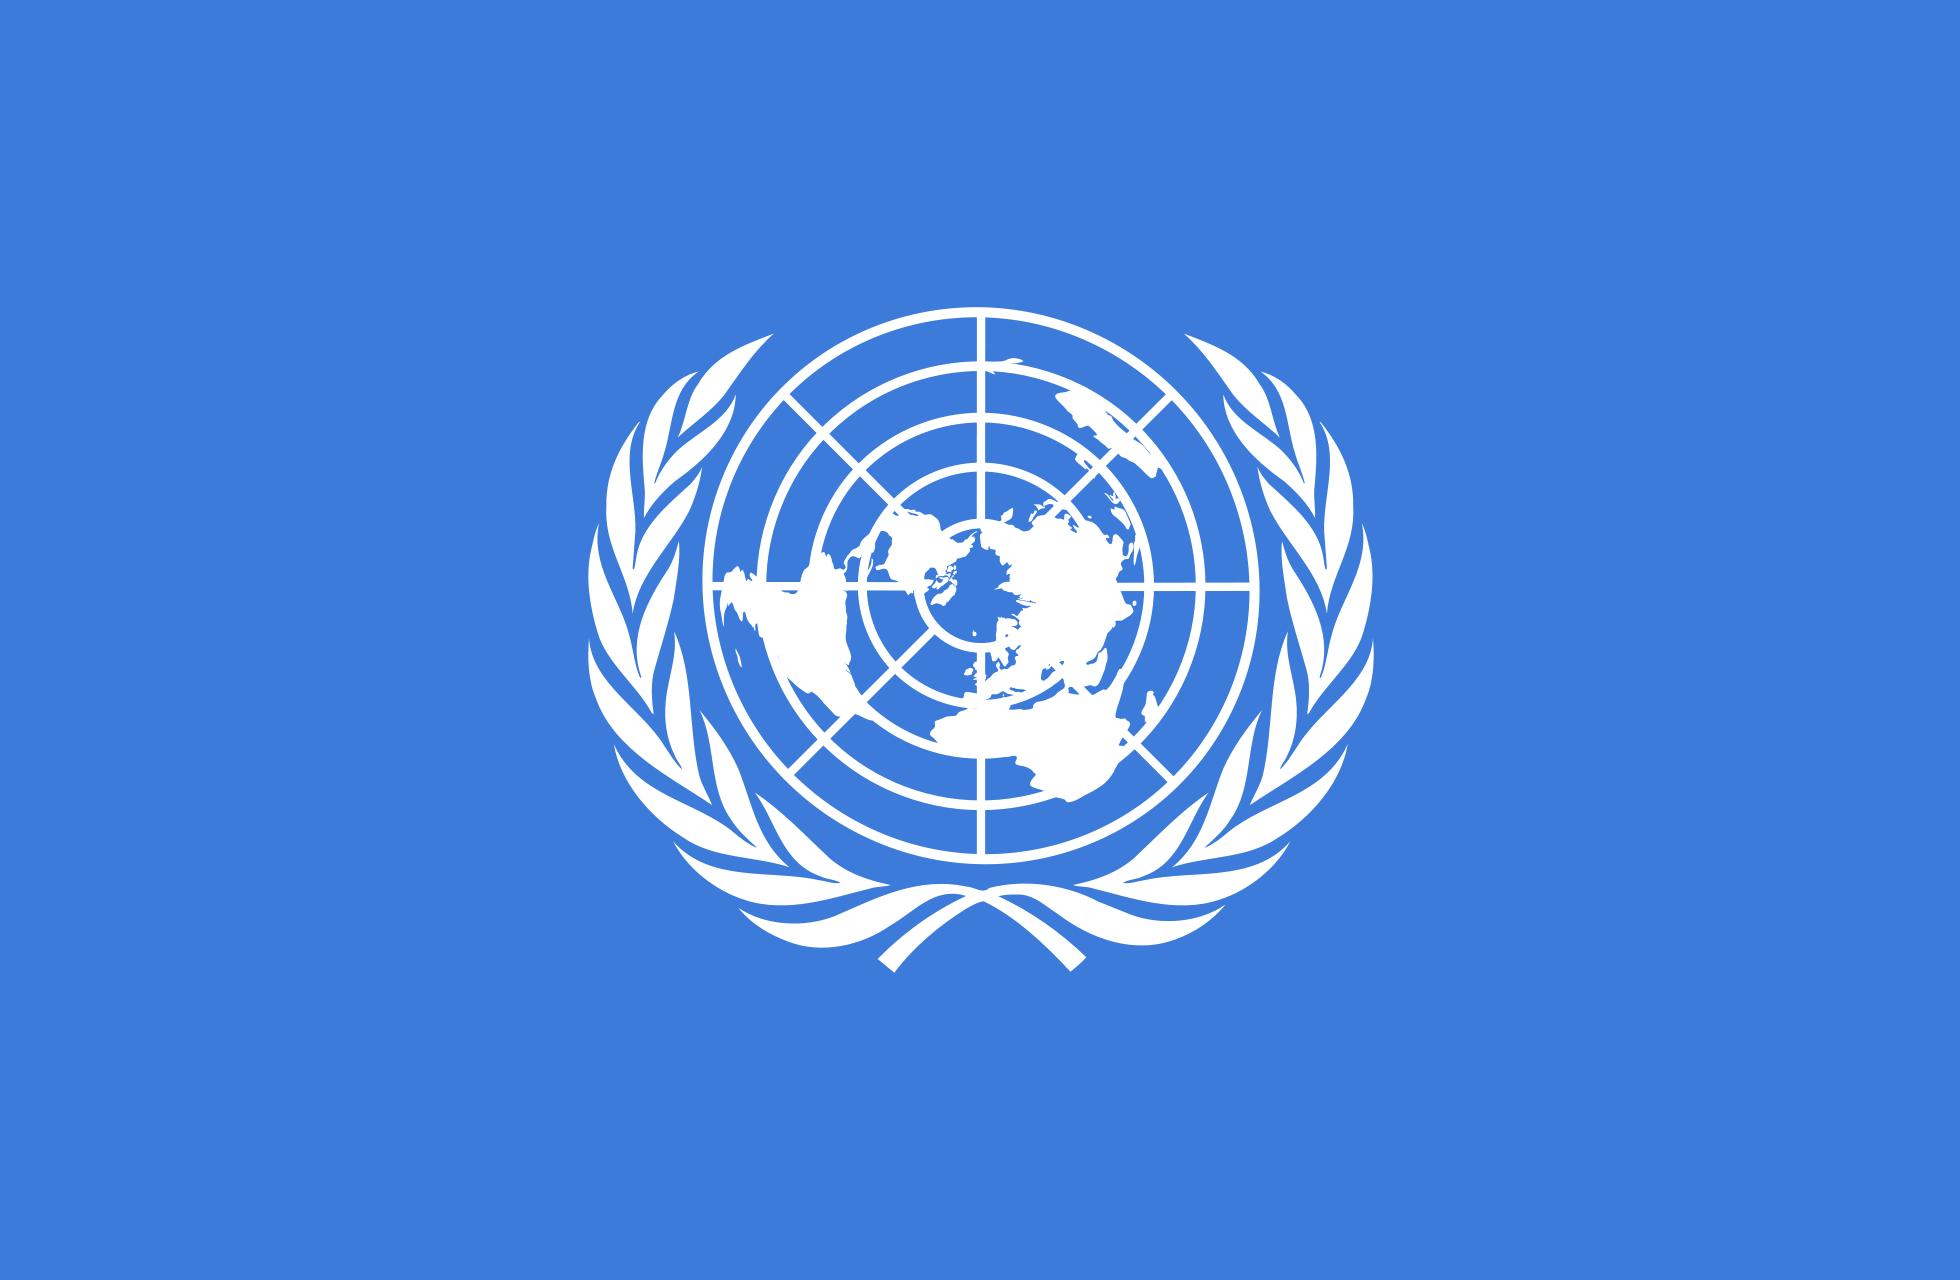 United_nations_flag.png